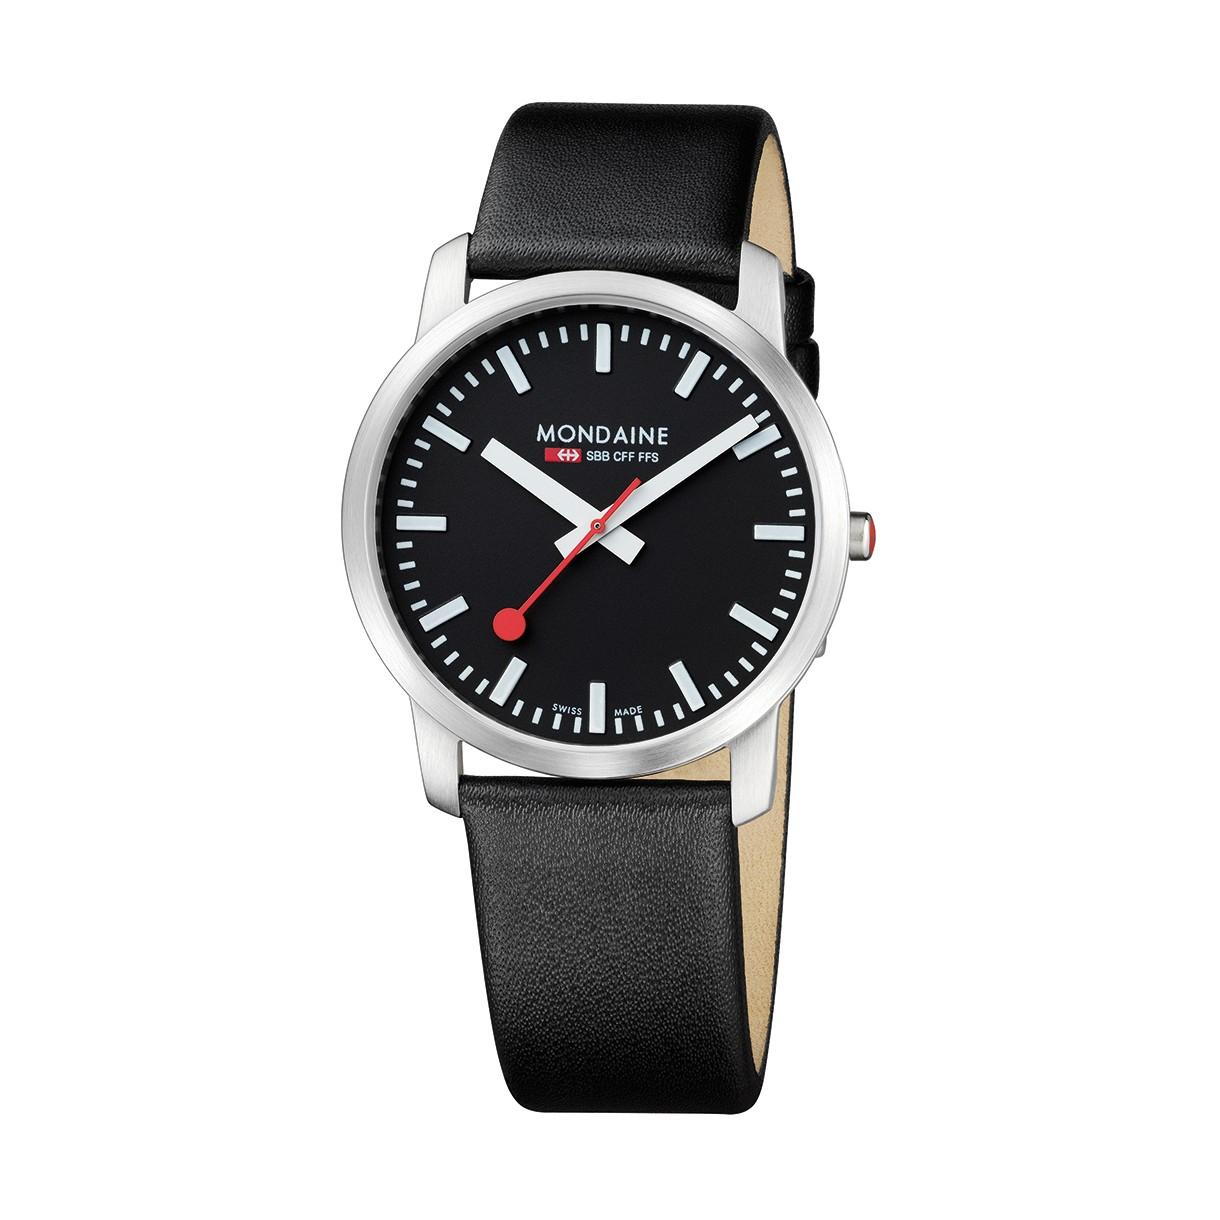 Mondaine swiss watch SIMPLY ELEGANT GENTS - A638.30350.14SBB